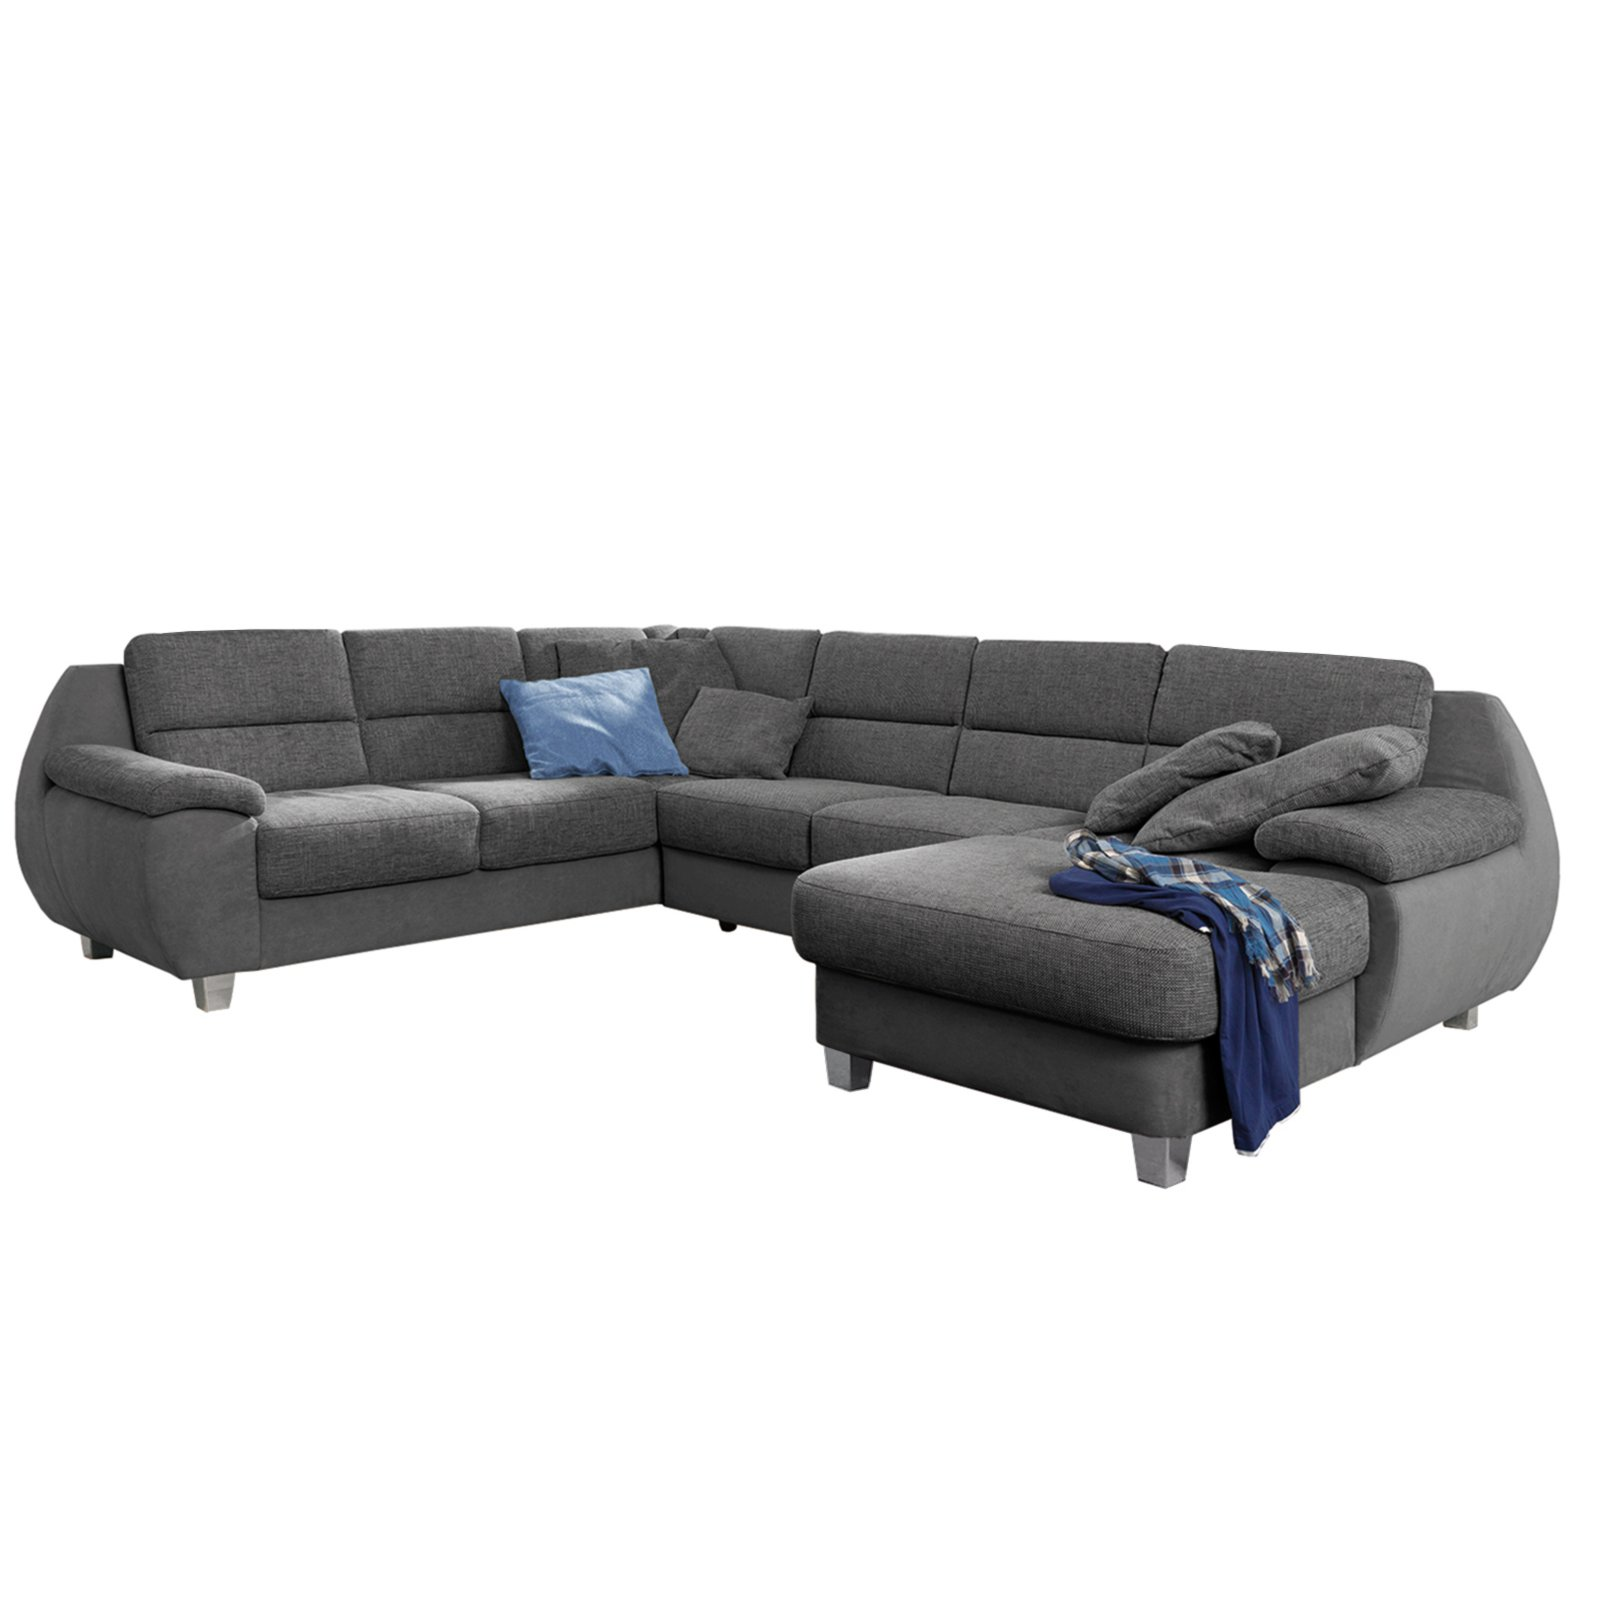 wohnlandschaft grau materialmix wohnlandschaften u. Black Bedroom Furniture Sets. Home Design Ideas